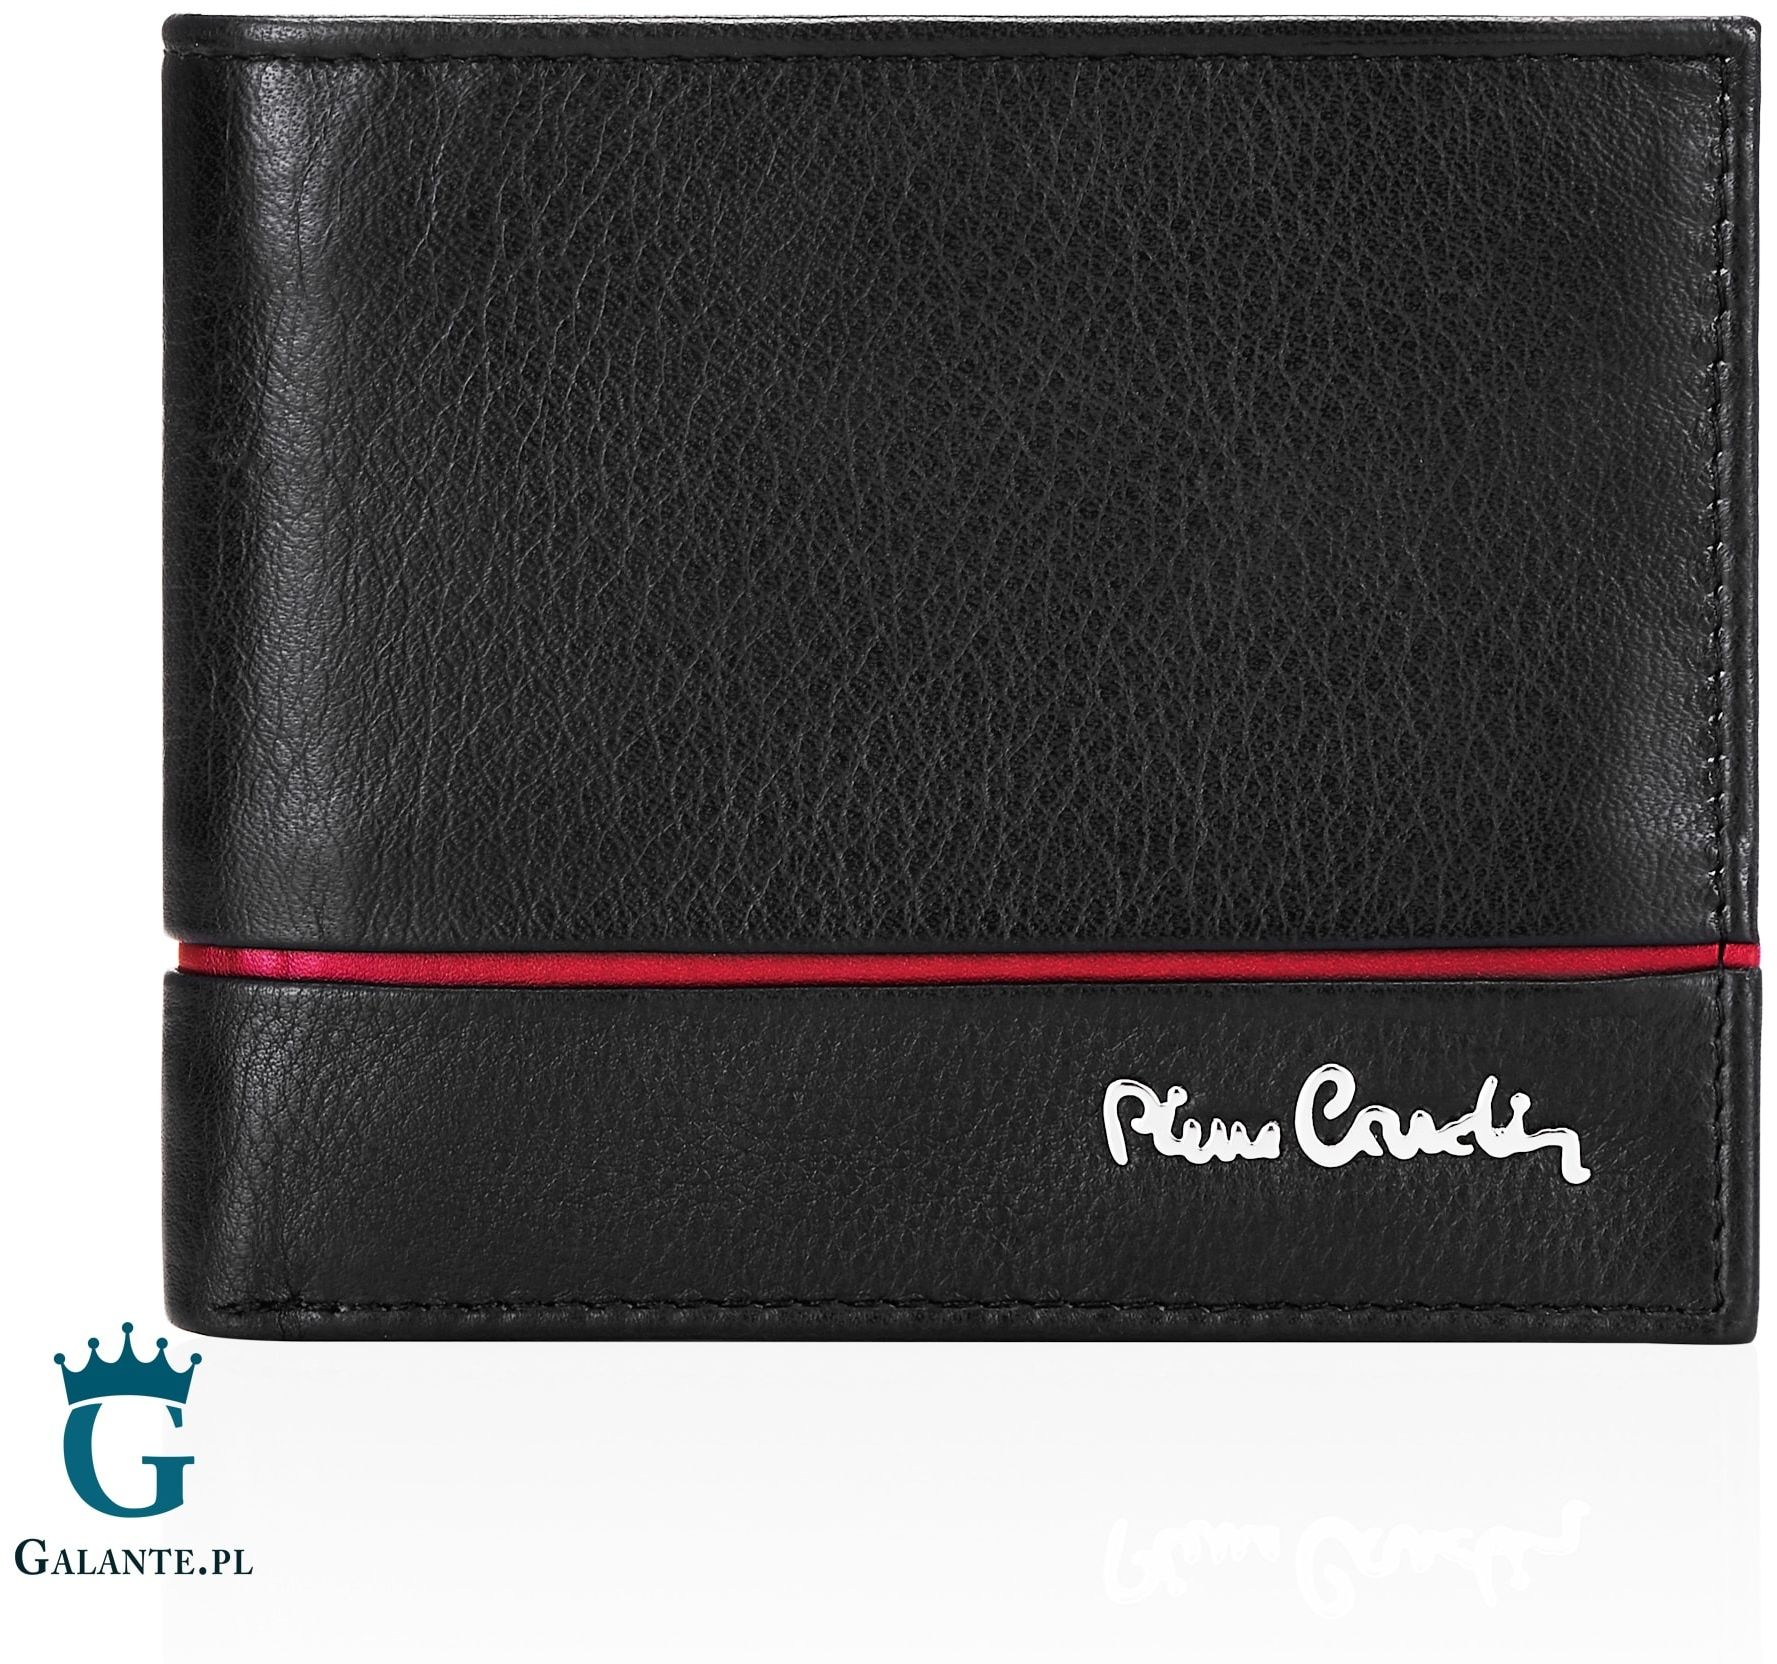 Mały portfel męski pierre cardin tilak15 8824